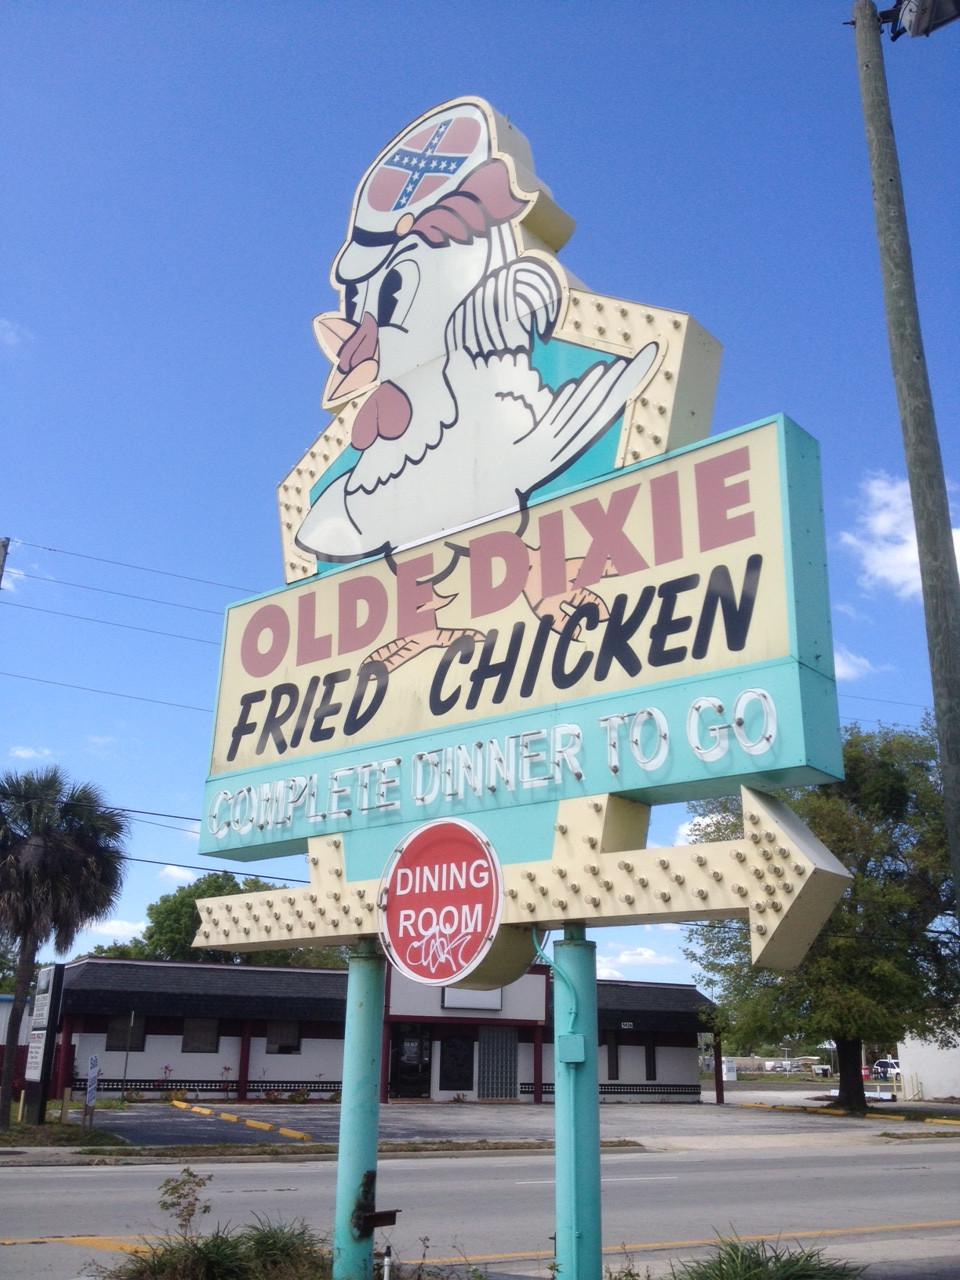 Olde Dixie Fried Chicken  Olde Dixie Fried Chicken